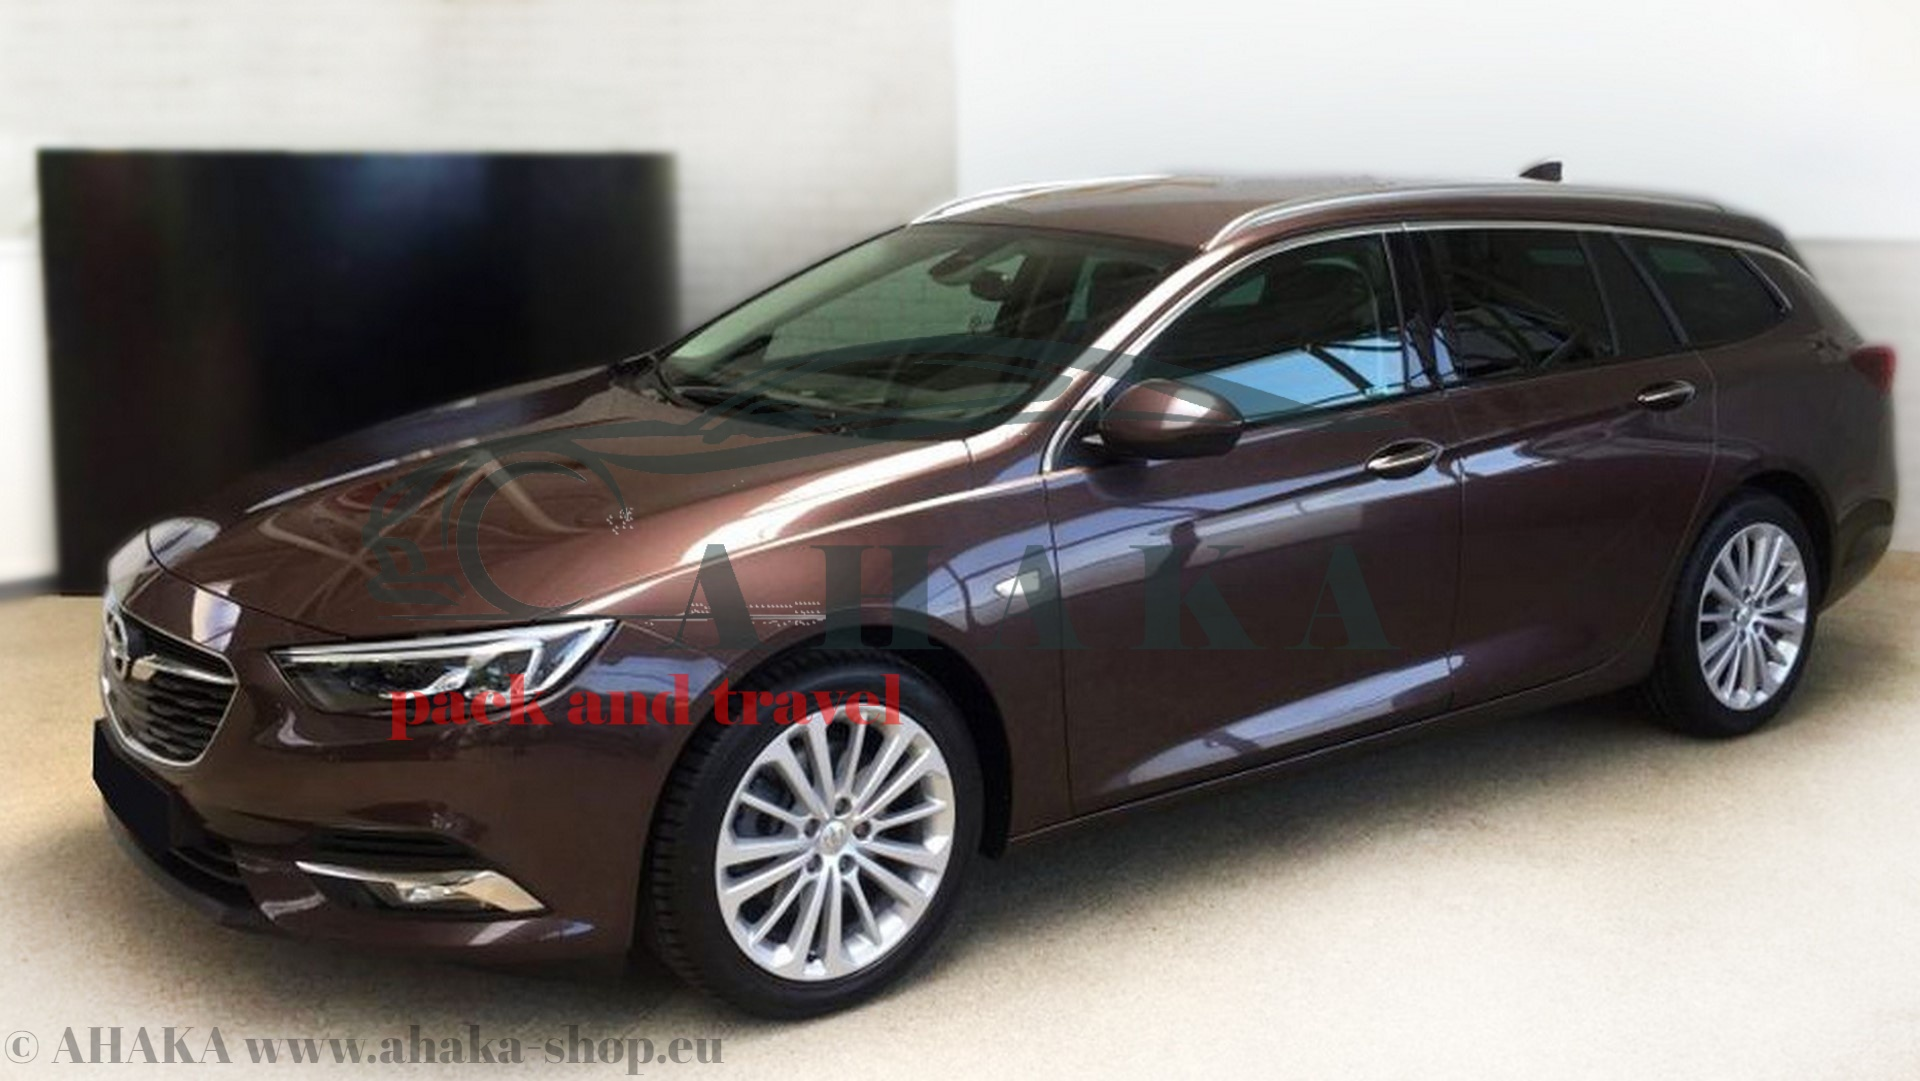 Für Opel Insignia Sportst 13polig neu 09 AUTO HAK Anhängerkupplung abnehmbar